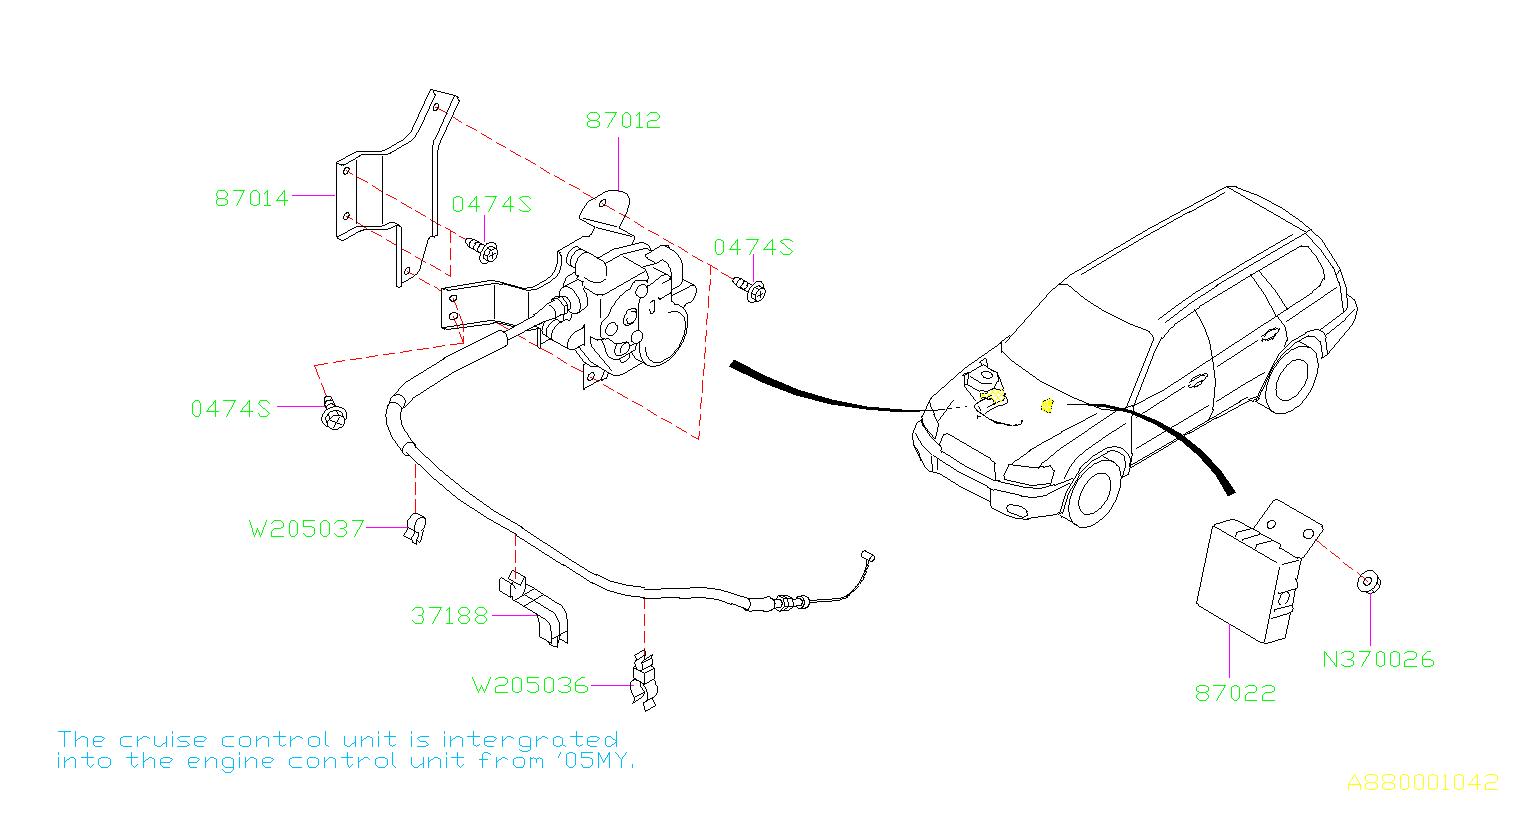 Subaru Forester Clip-accelerator cable. No.1. Cruise